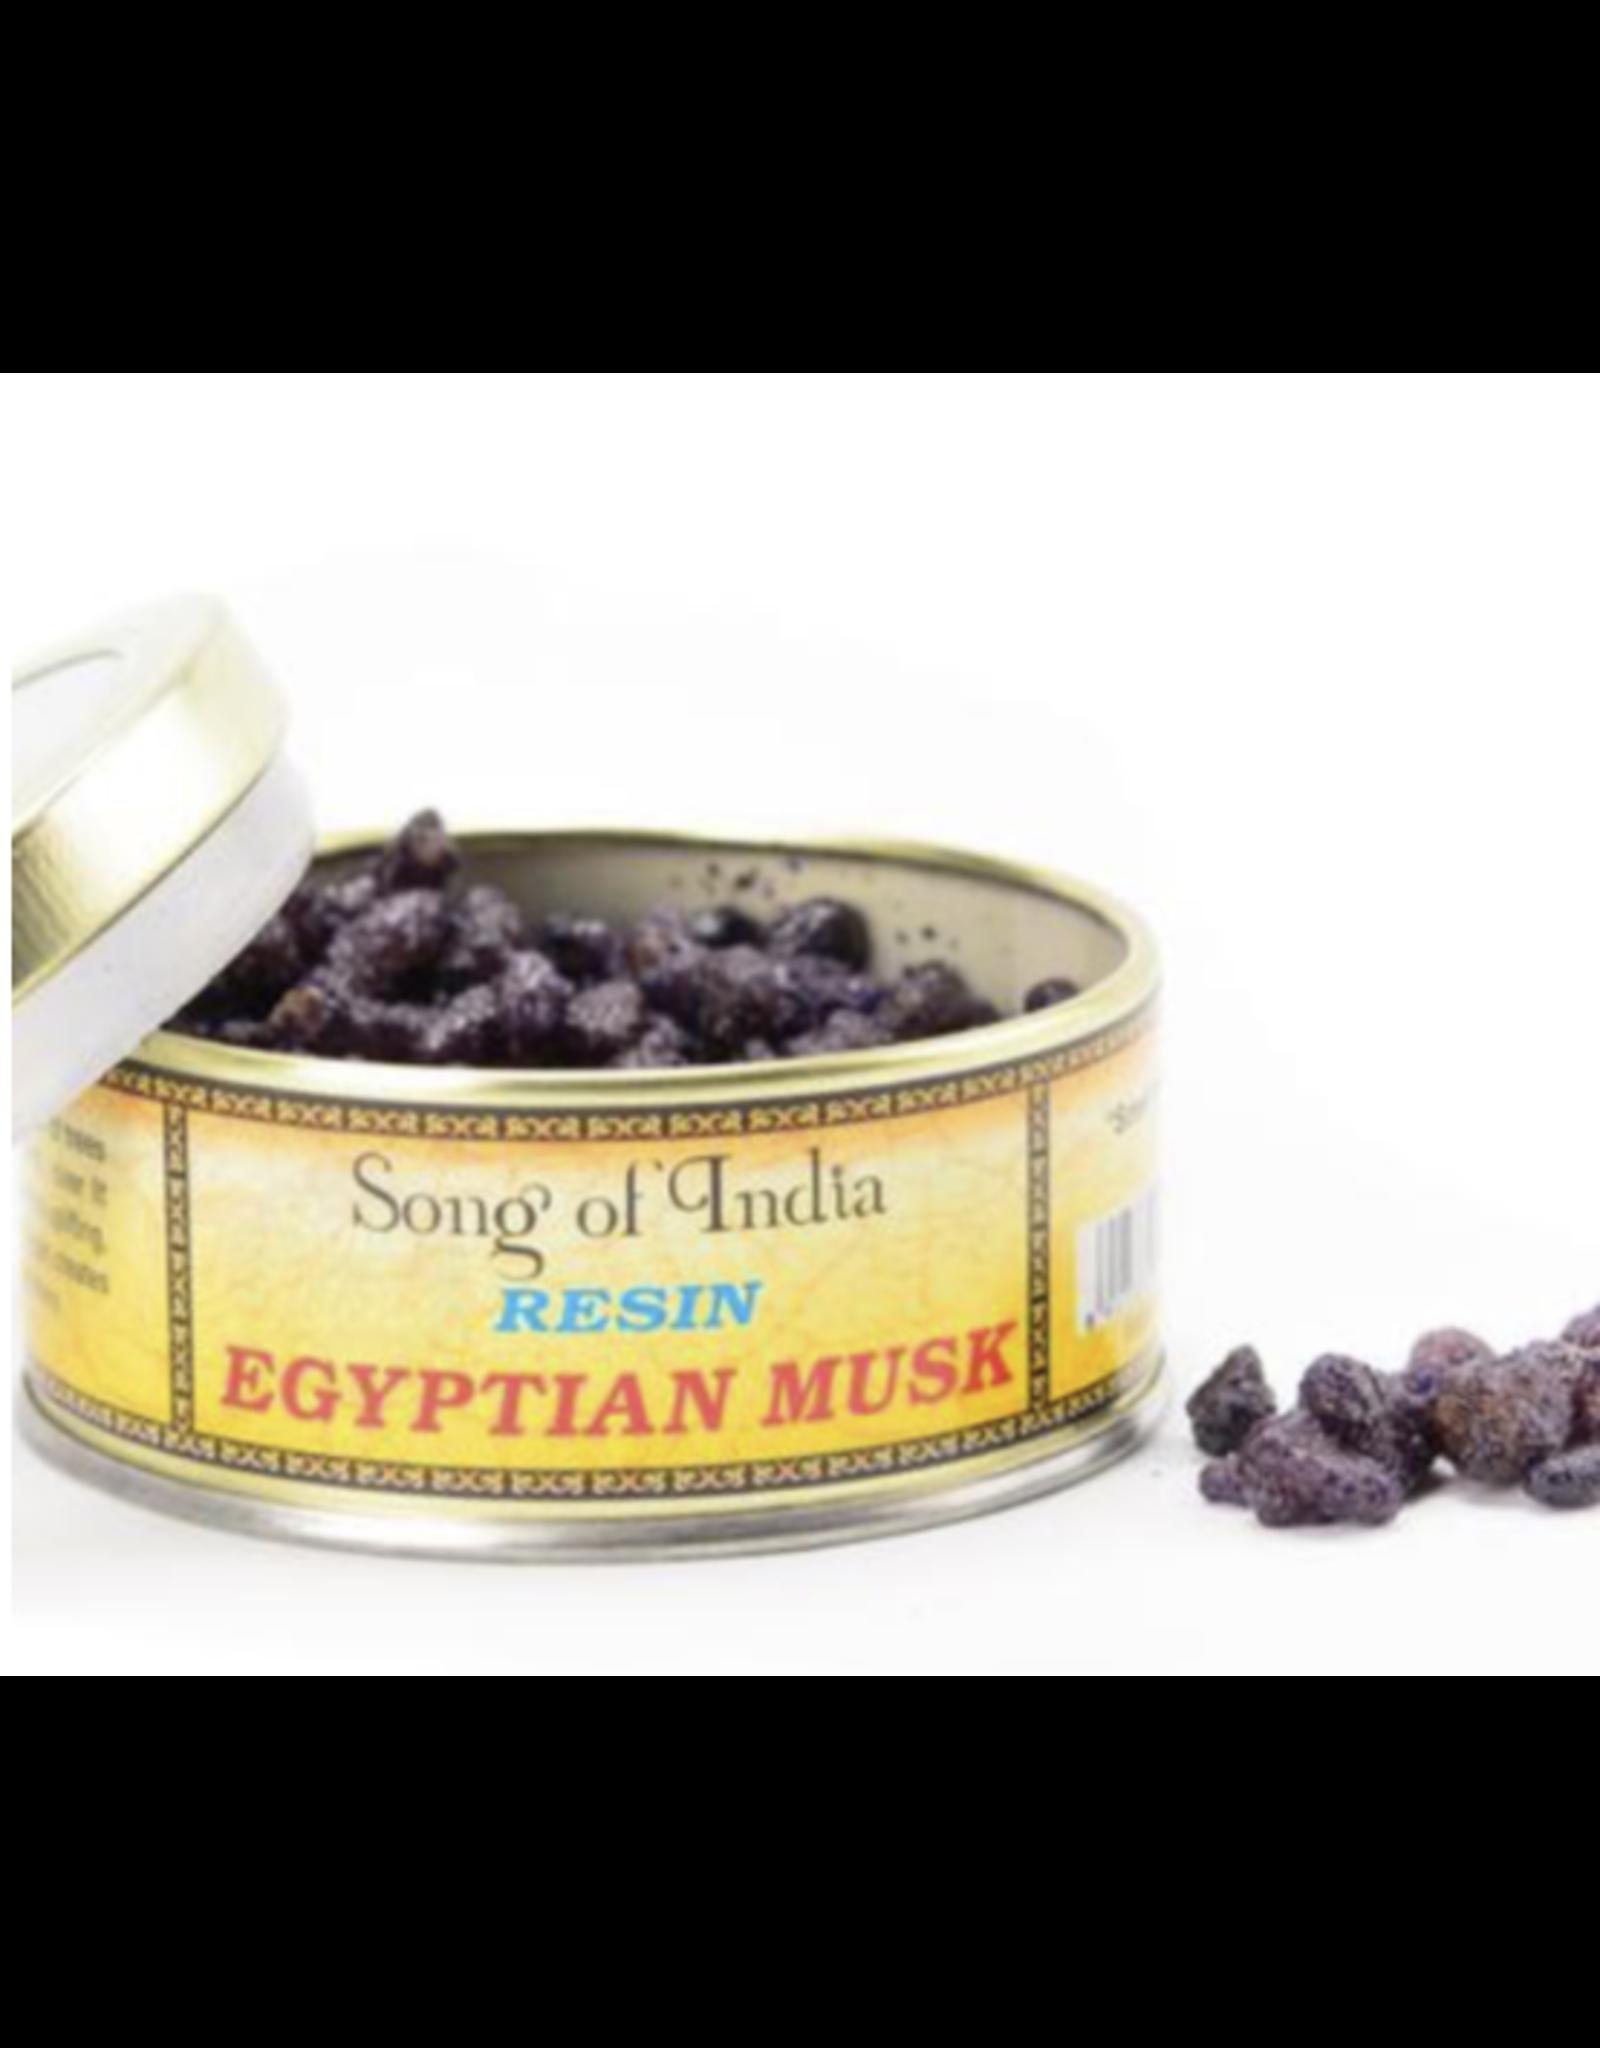 Egyptian Musk - Natural Resin Incense